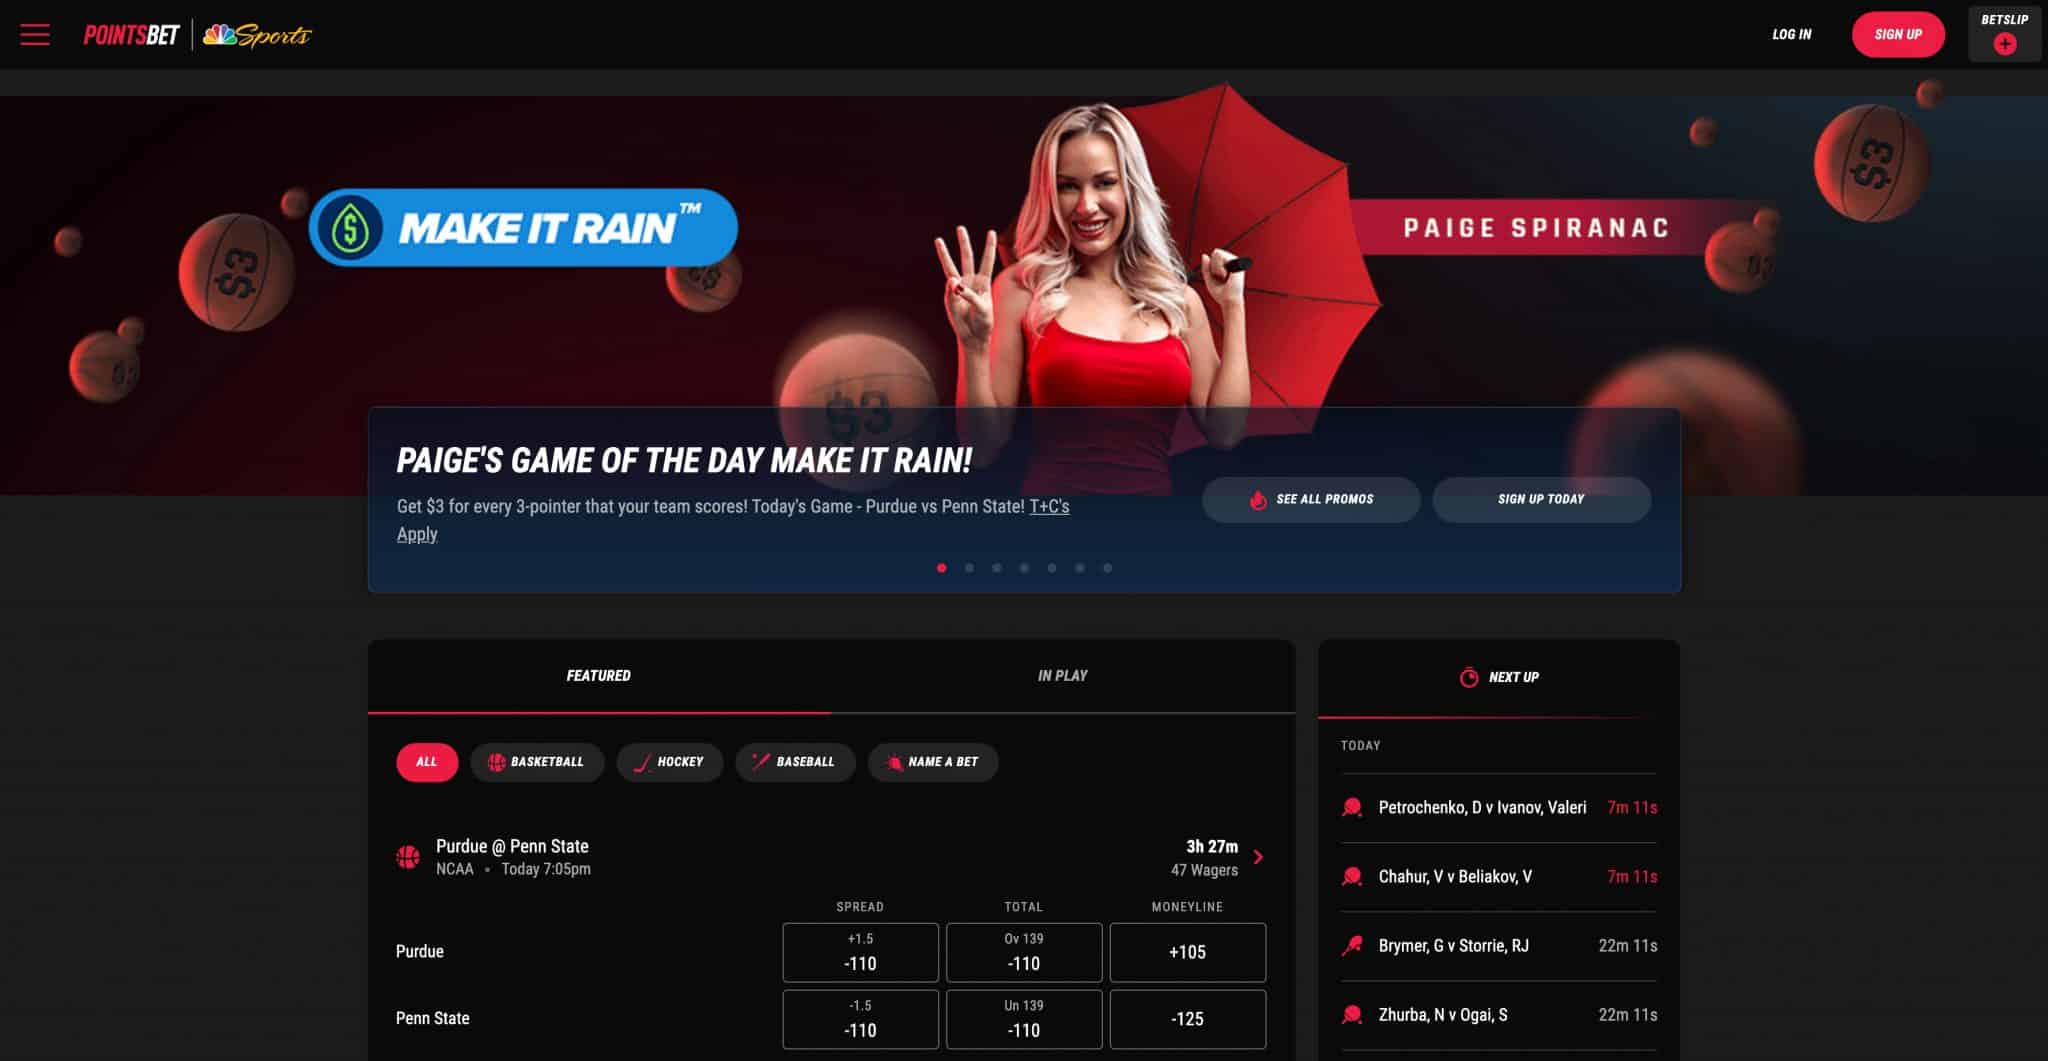 ESNY, PointsBet Website